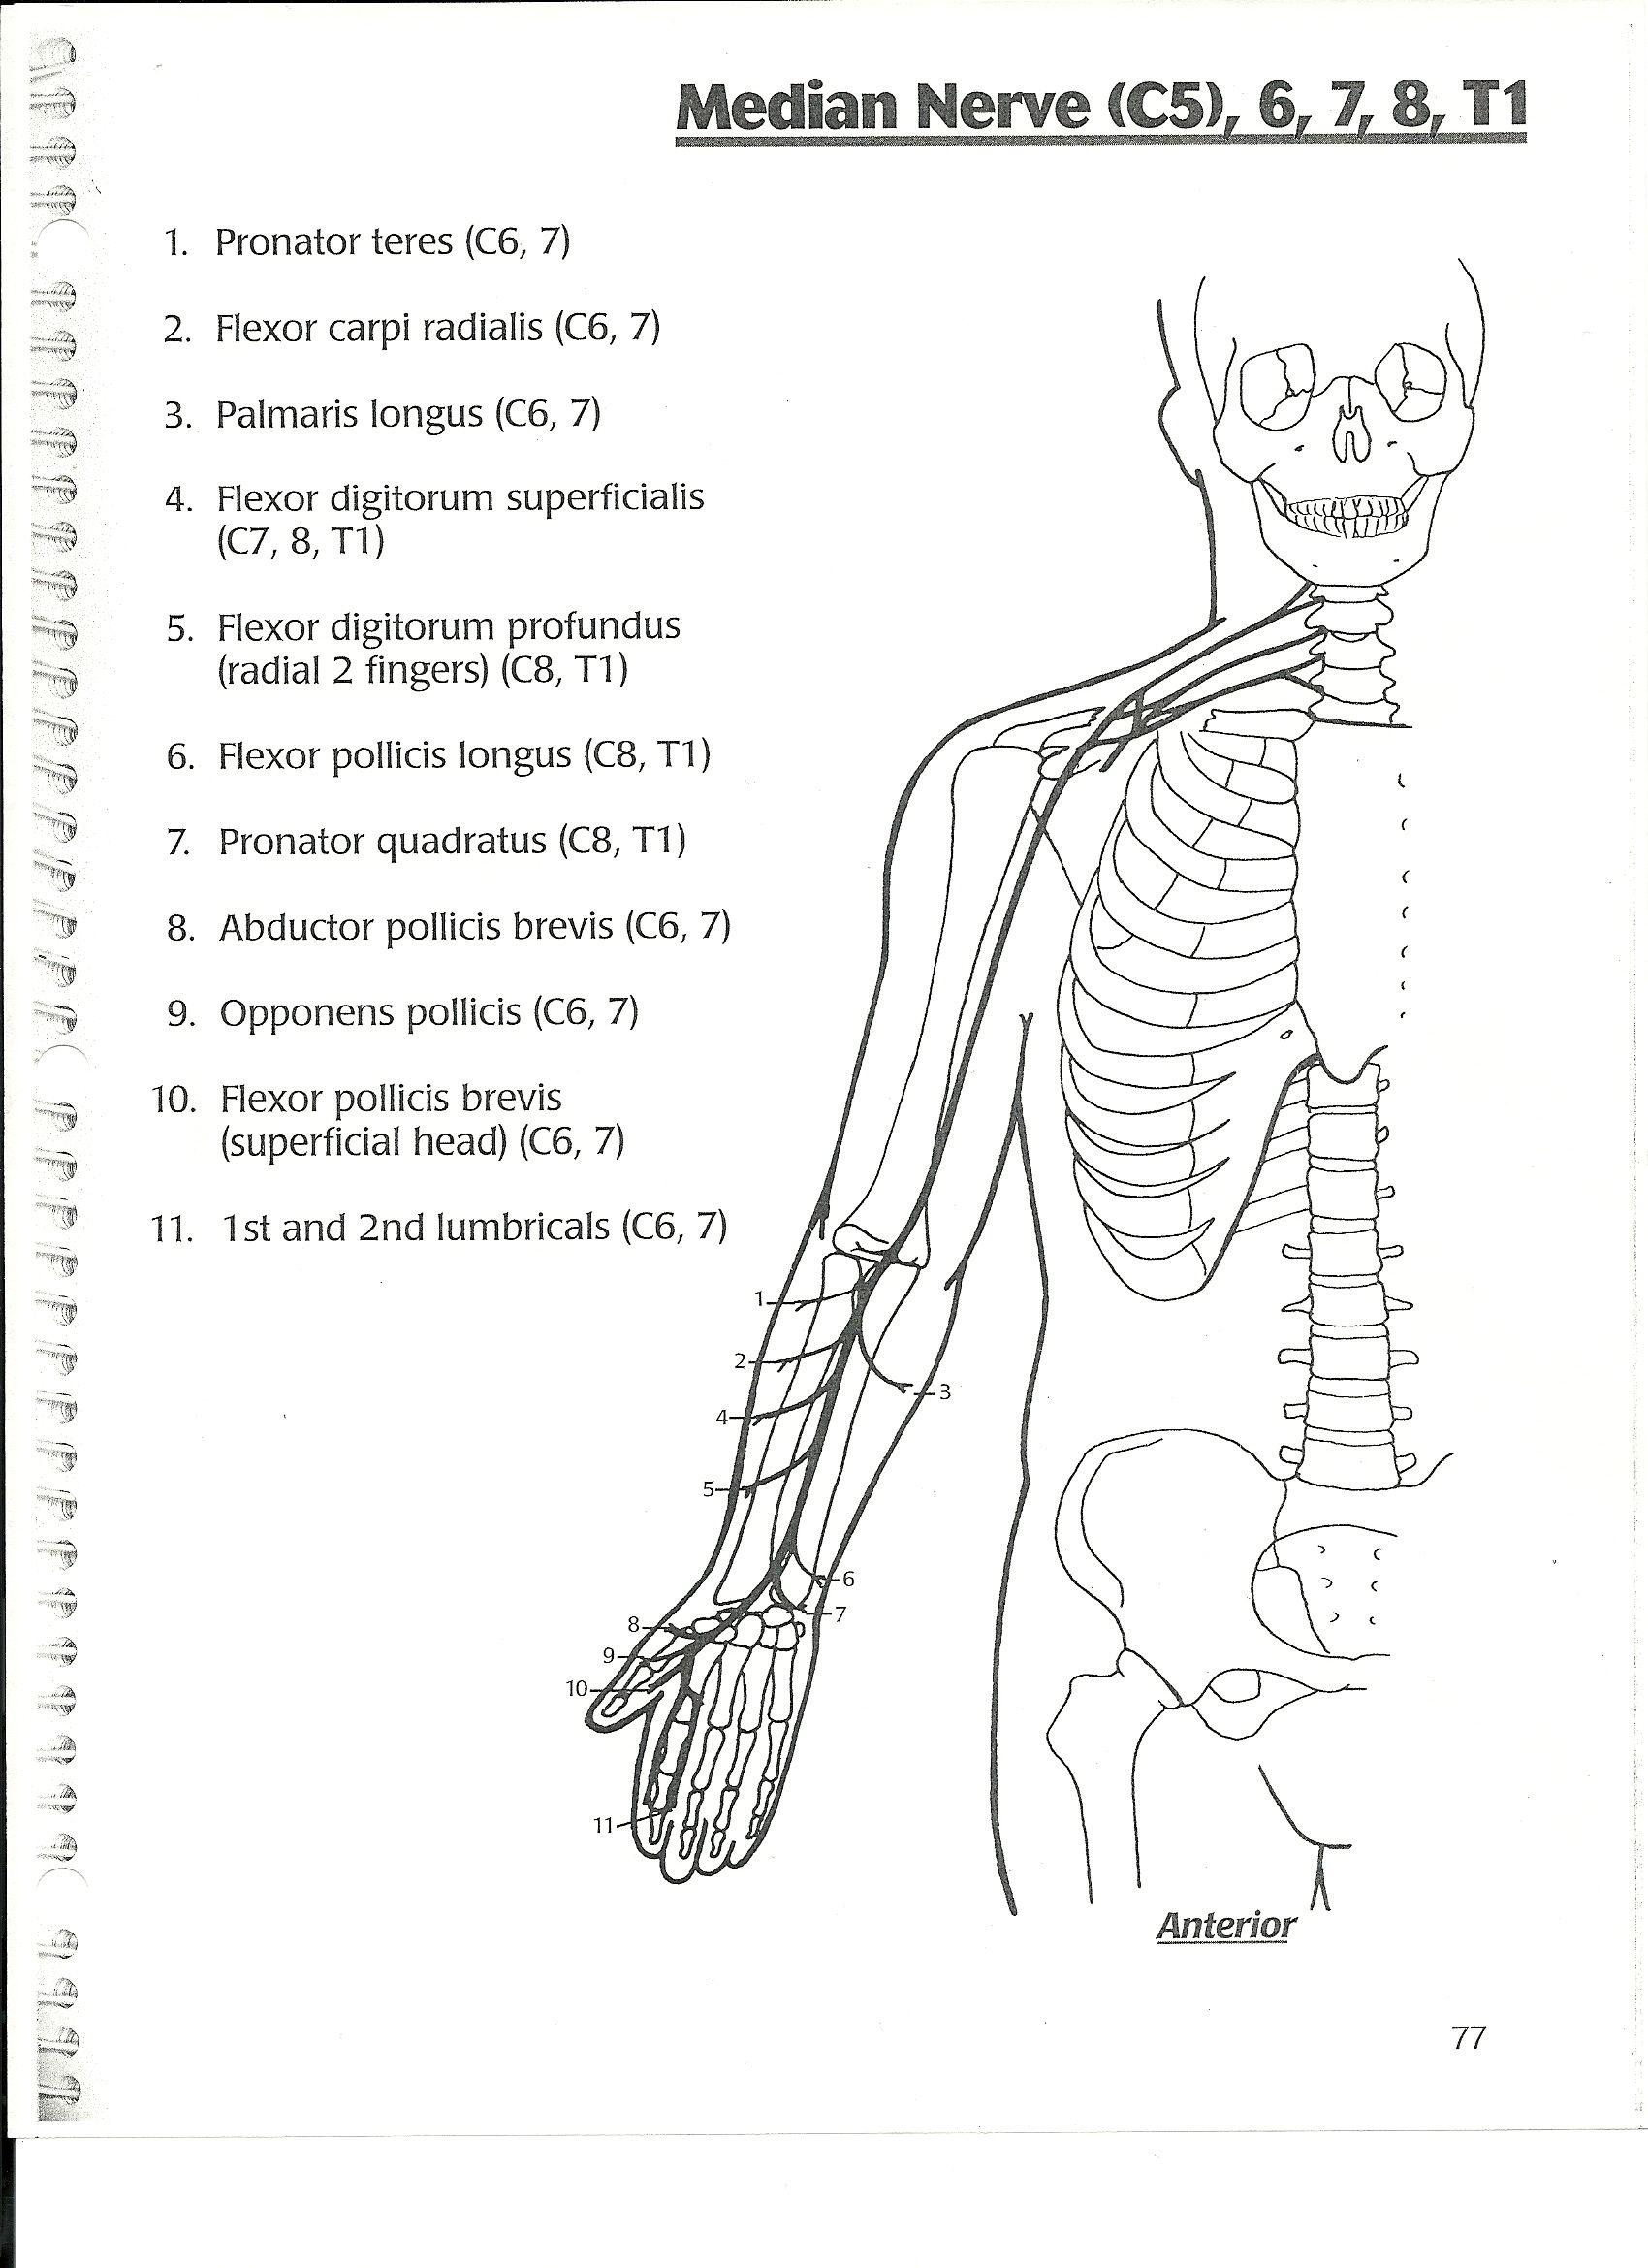 median nerve | Occupational Therapy | Pinterest | Median nerve ...